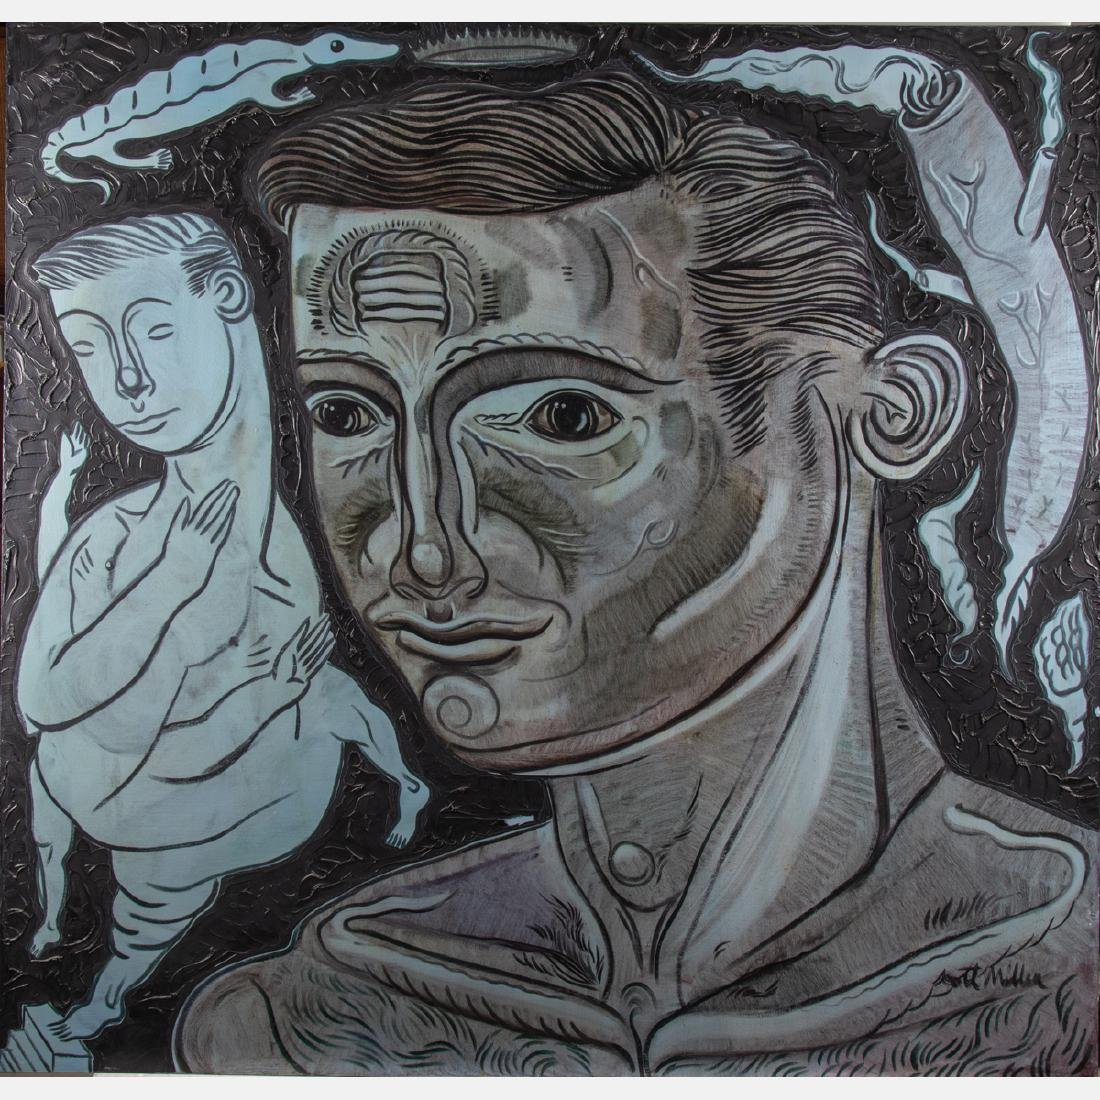 Scott Miller (1955-2008) Untitled, Oil on canvas,